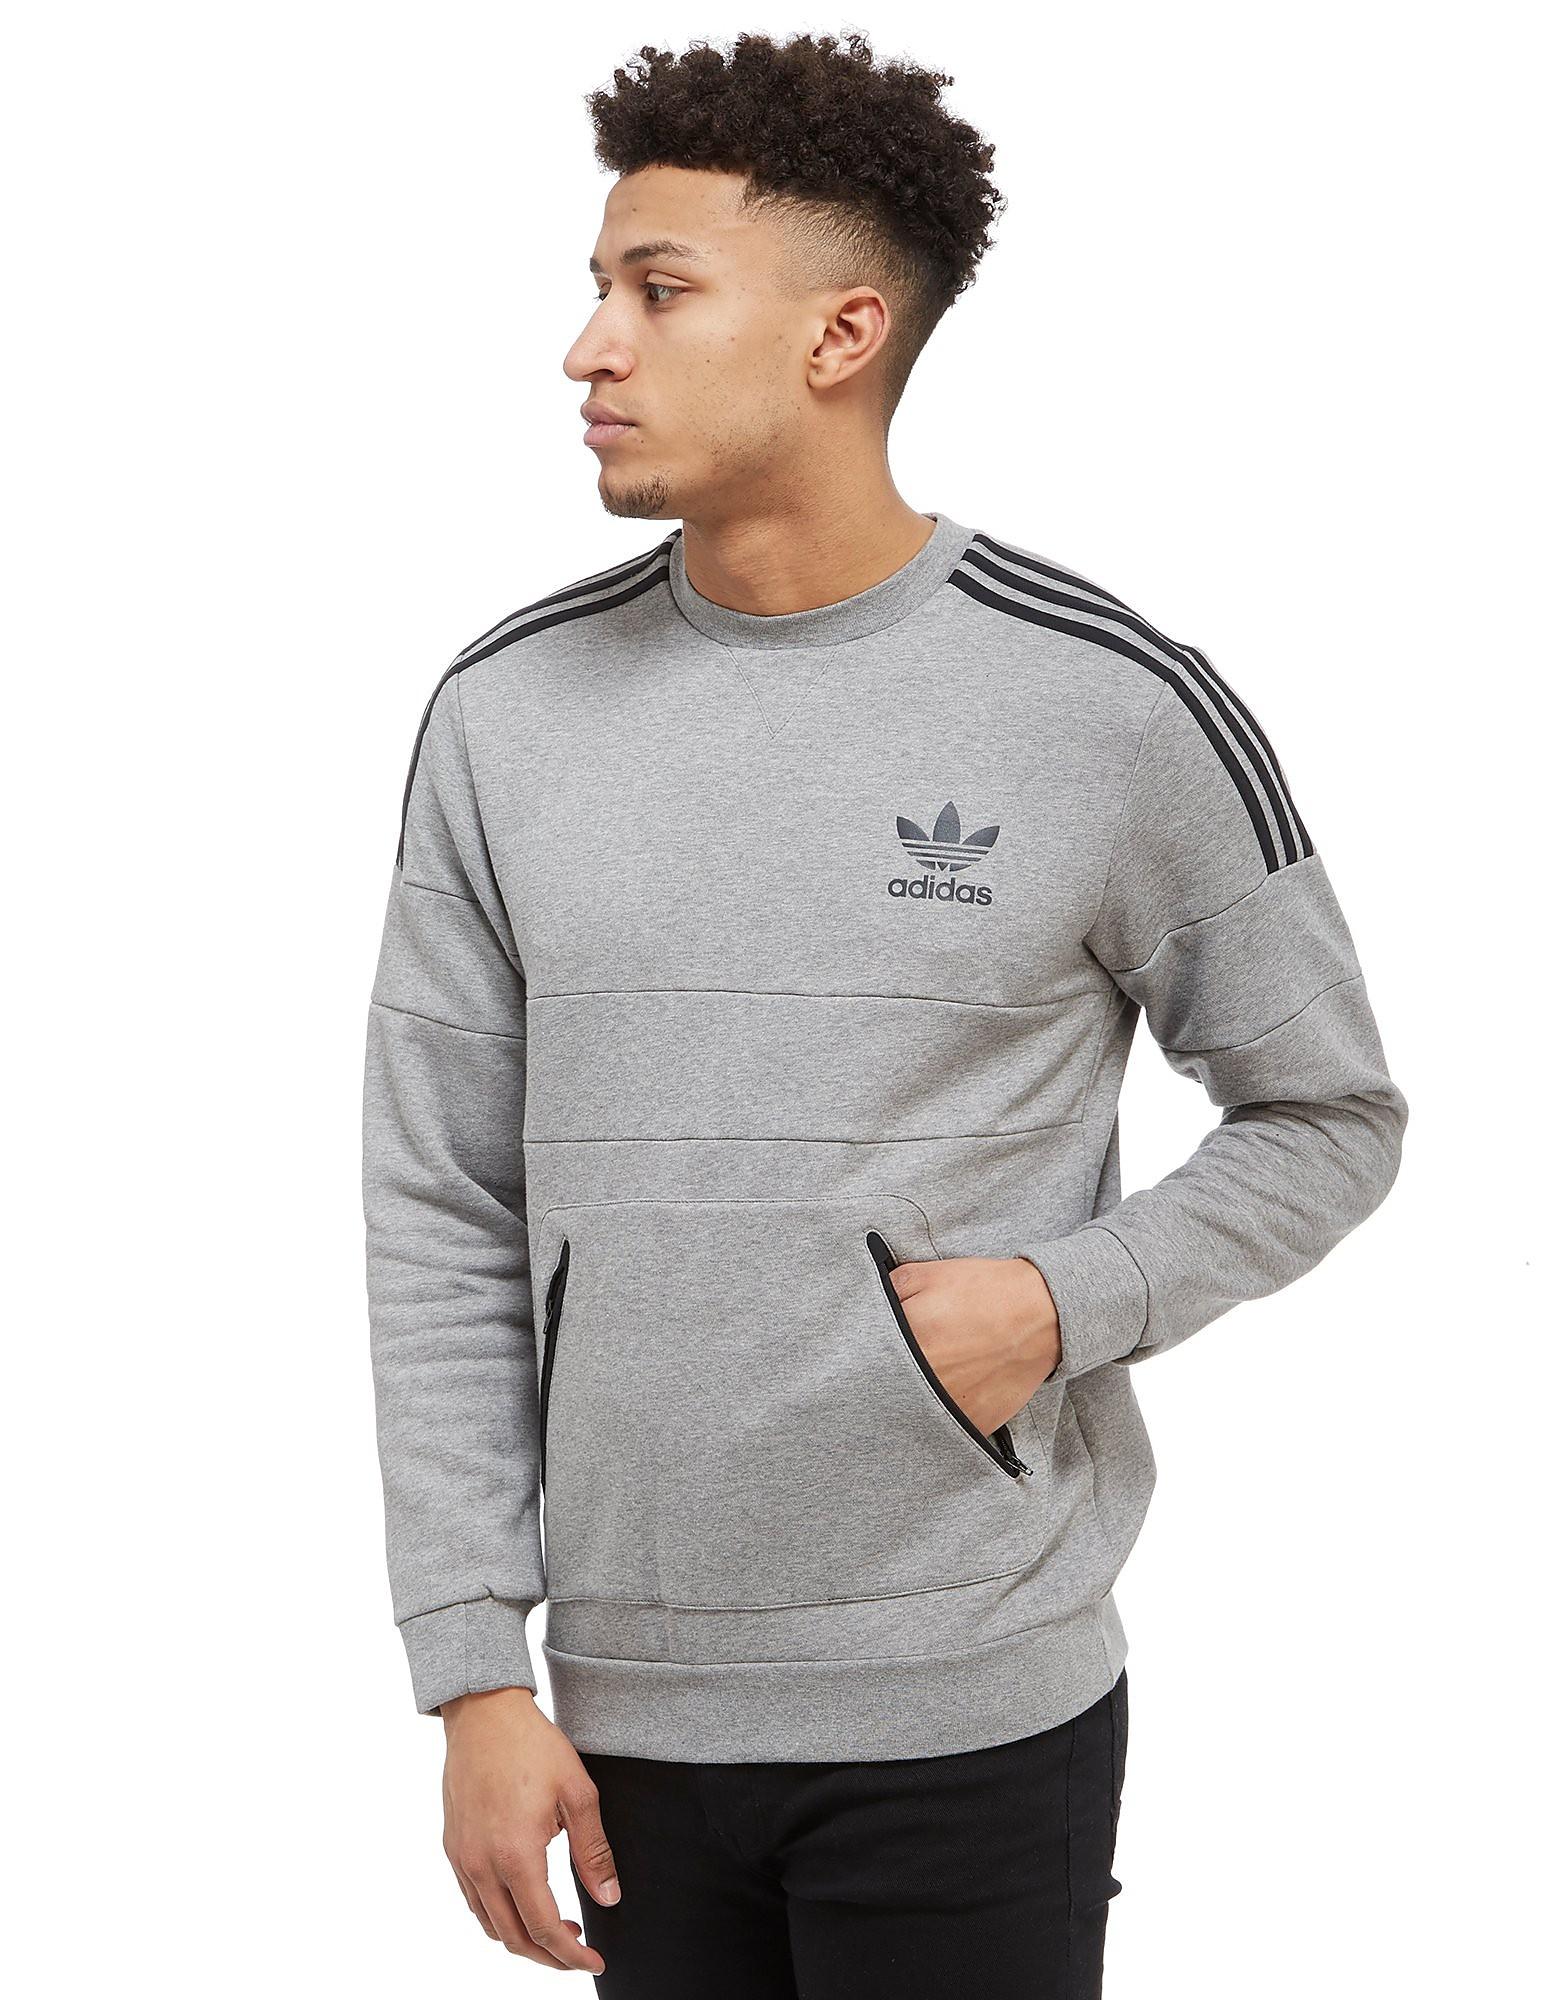 adidas Originals Nomad Pocket Sweatshirt